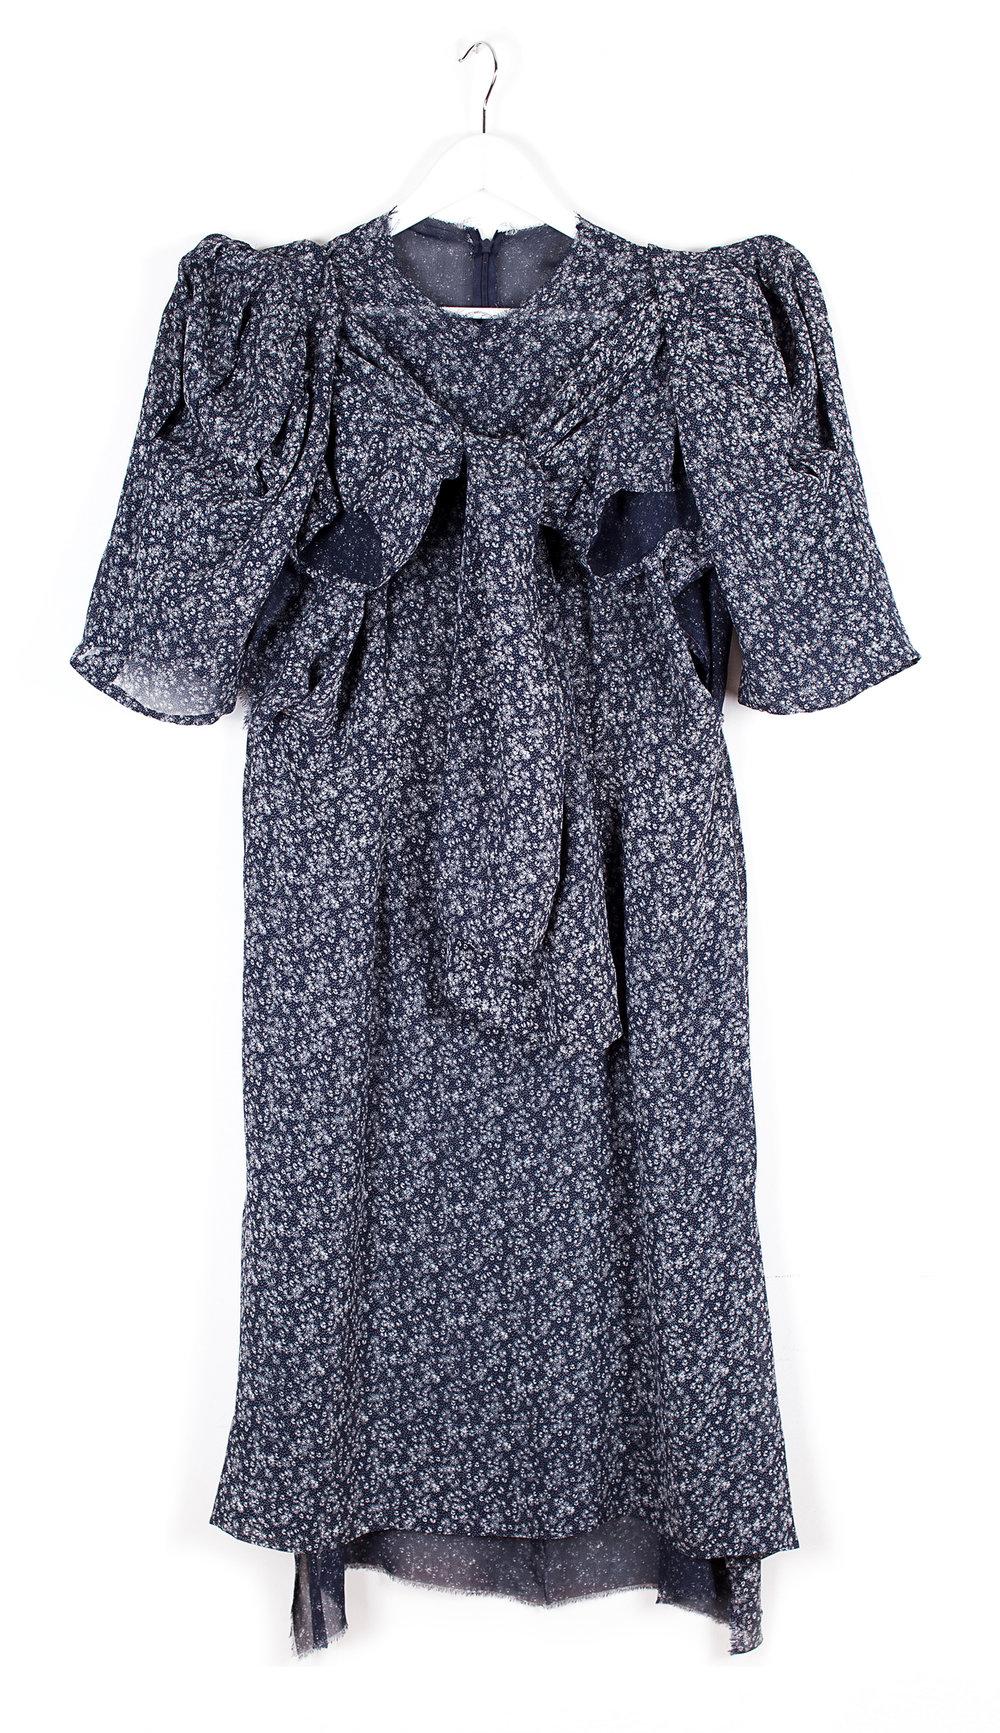 Dress 03: Stage 3